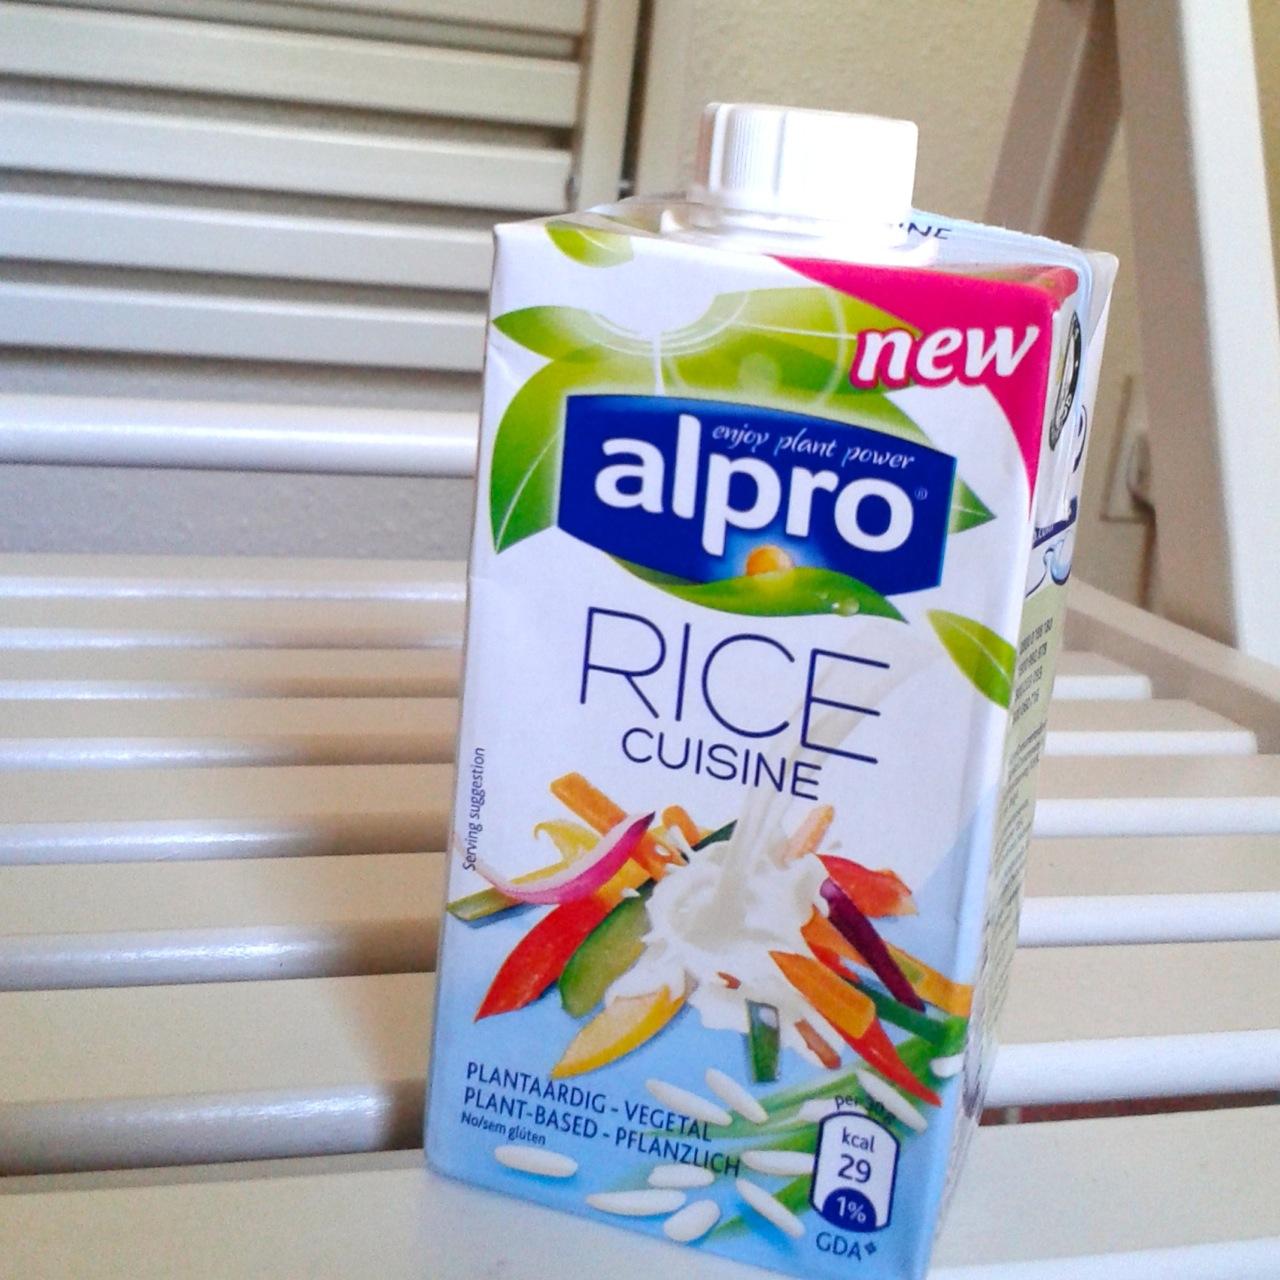 https://i0.wp.com/fatgayvegan.com/wp-content/uploads/2014/07/rice-cream.jpg?fit=1280%2C1280